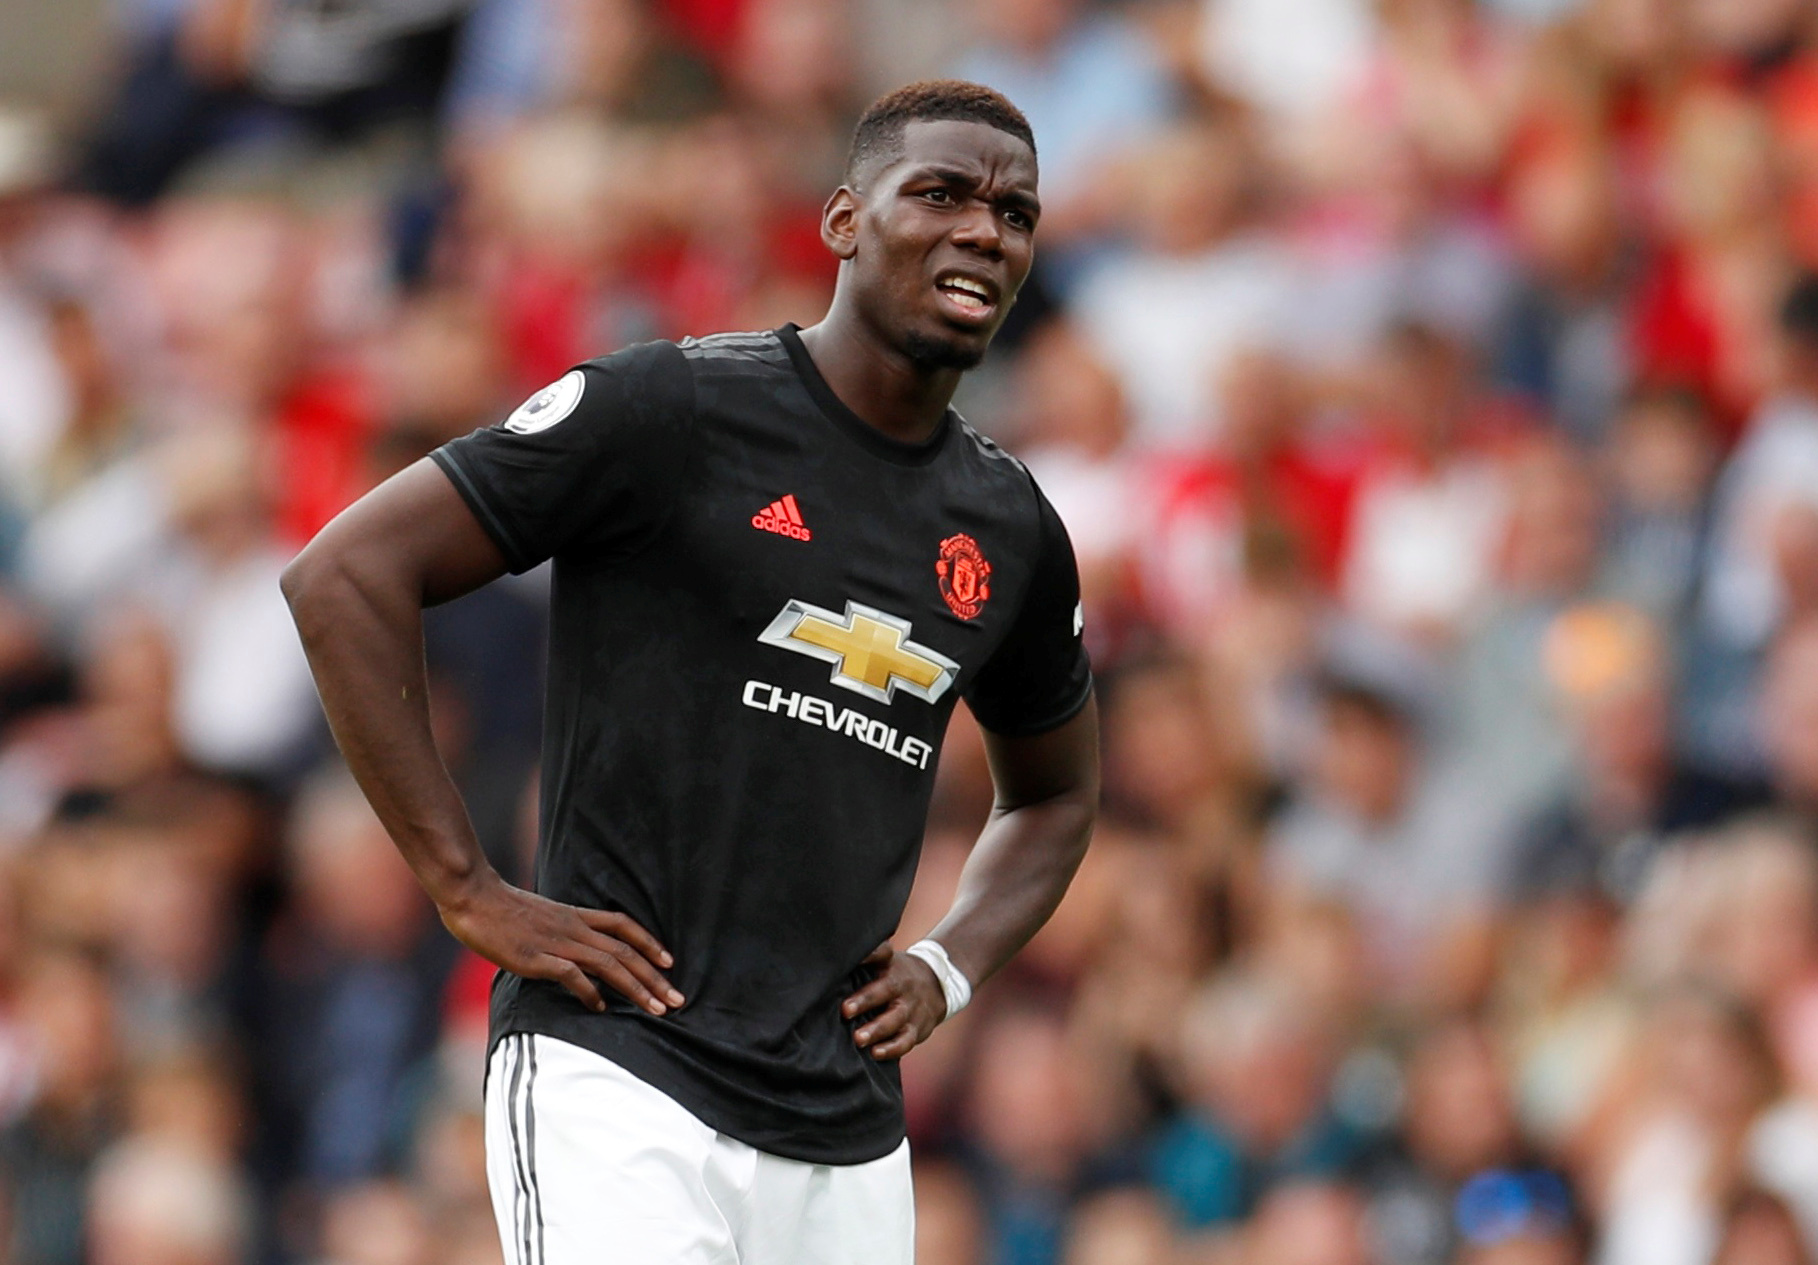 Football - Transferts - Journal du mercato: Manchester United se prépare à perdre Paul Pogba